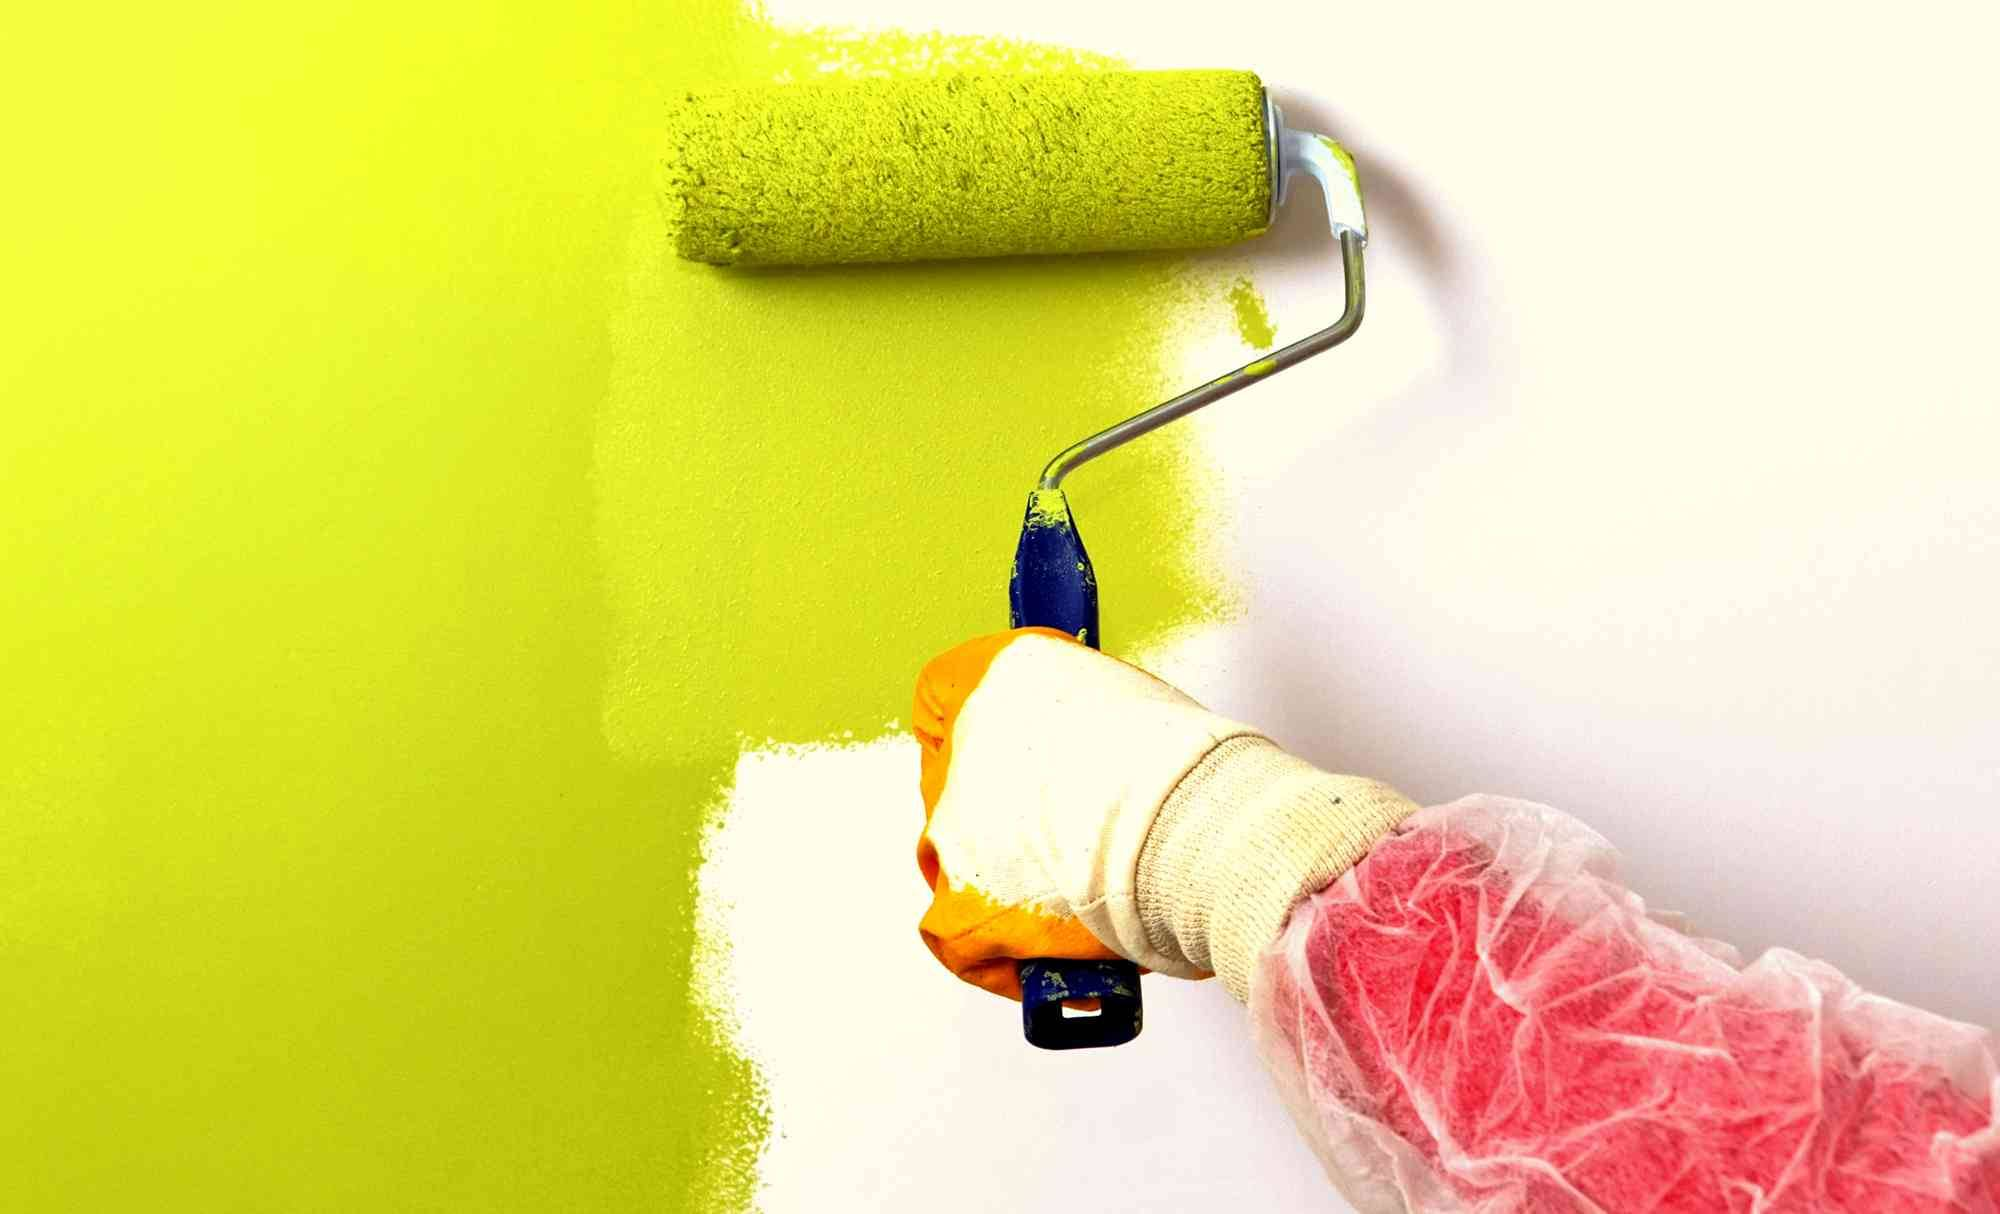 Краска для стен на кухне: варианты и критерии выбора